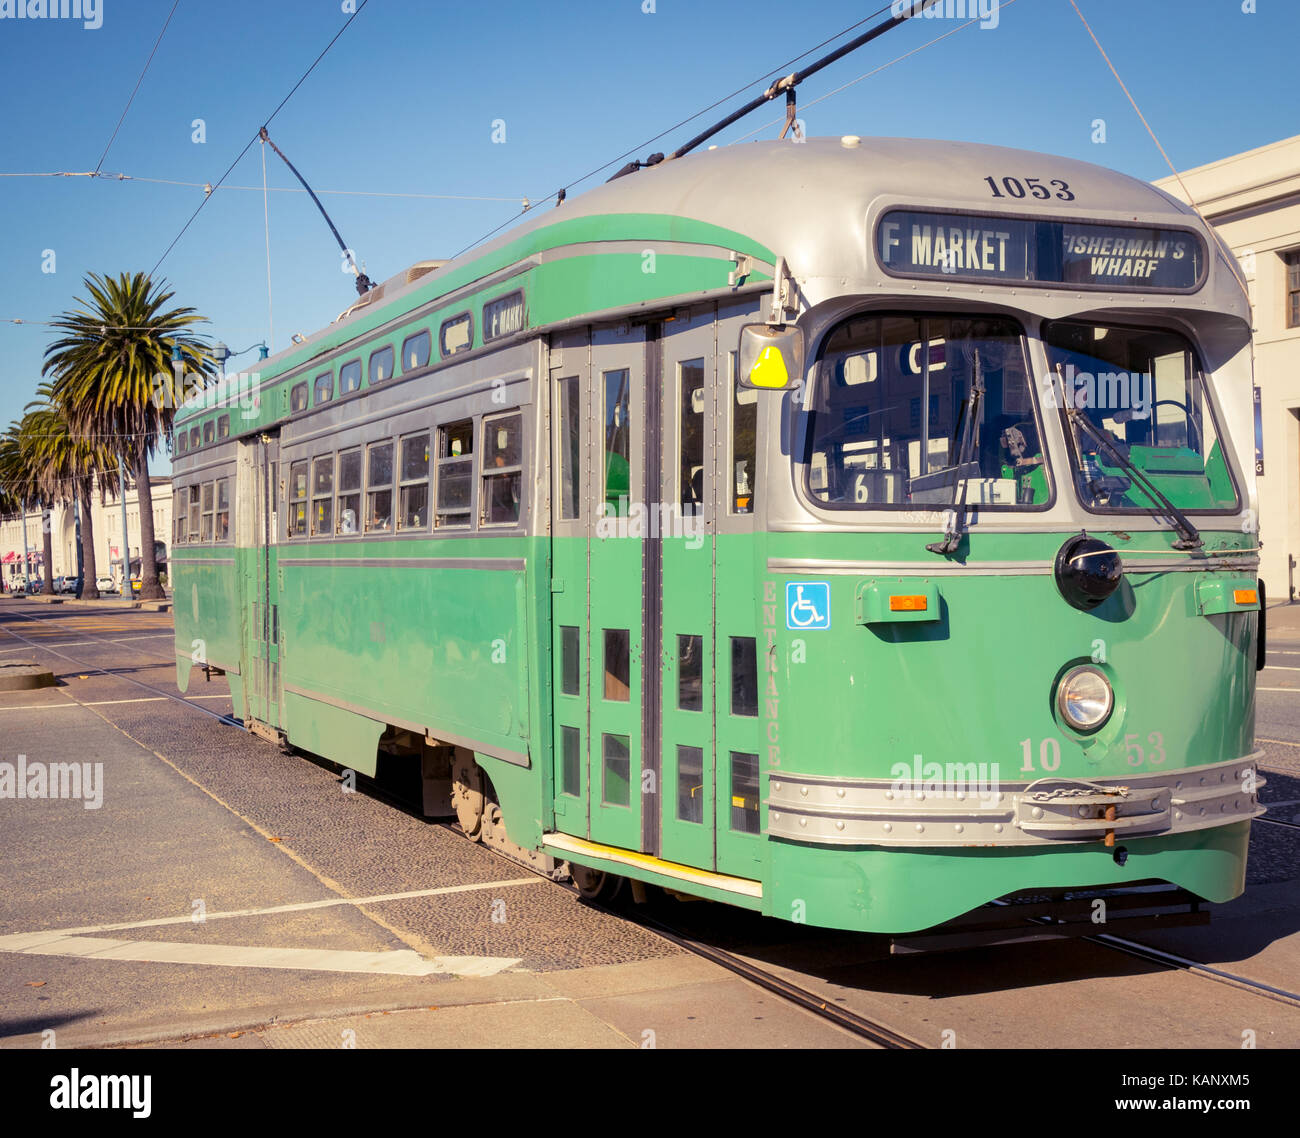 Historic streetcar (Brooklyn & Queens Transit Corporation No. 1053) at the Embarcadero in San Francisco, California. - Stock Image